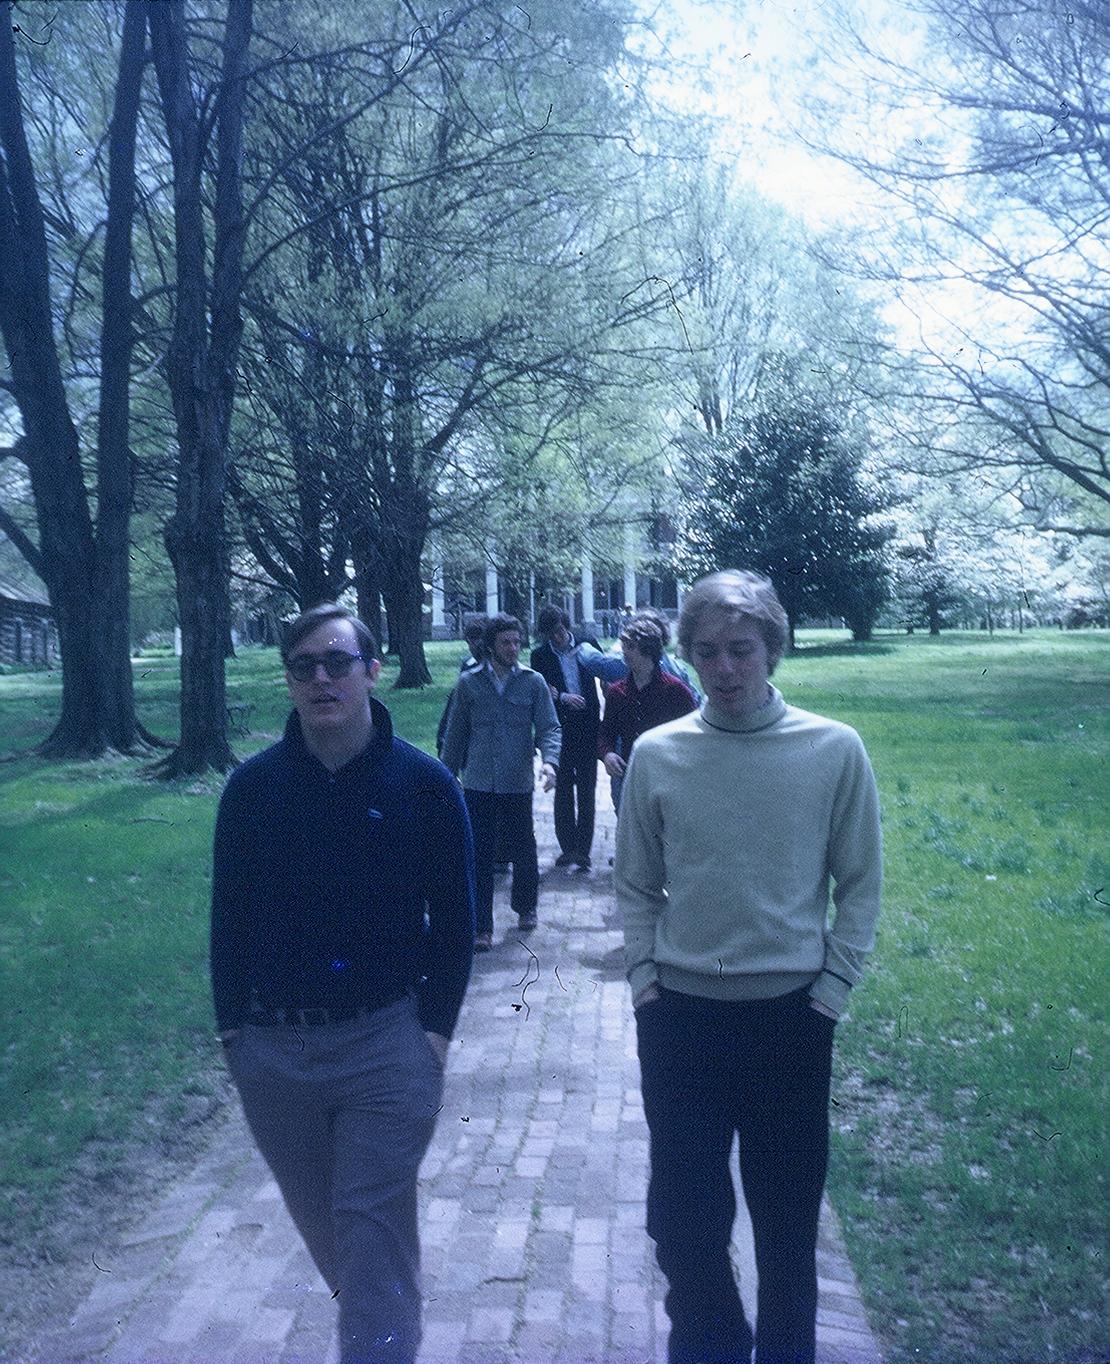 Spring_tour_1976_Monticello_staudt4-R1-E038.jpg